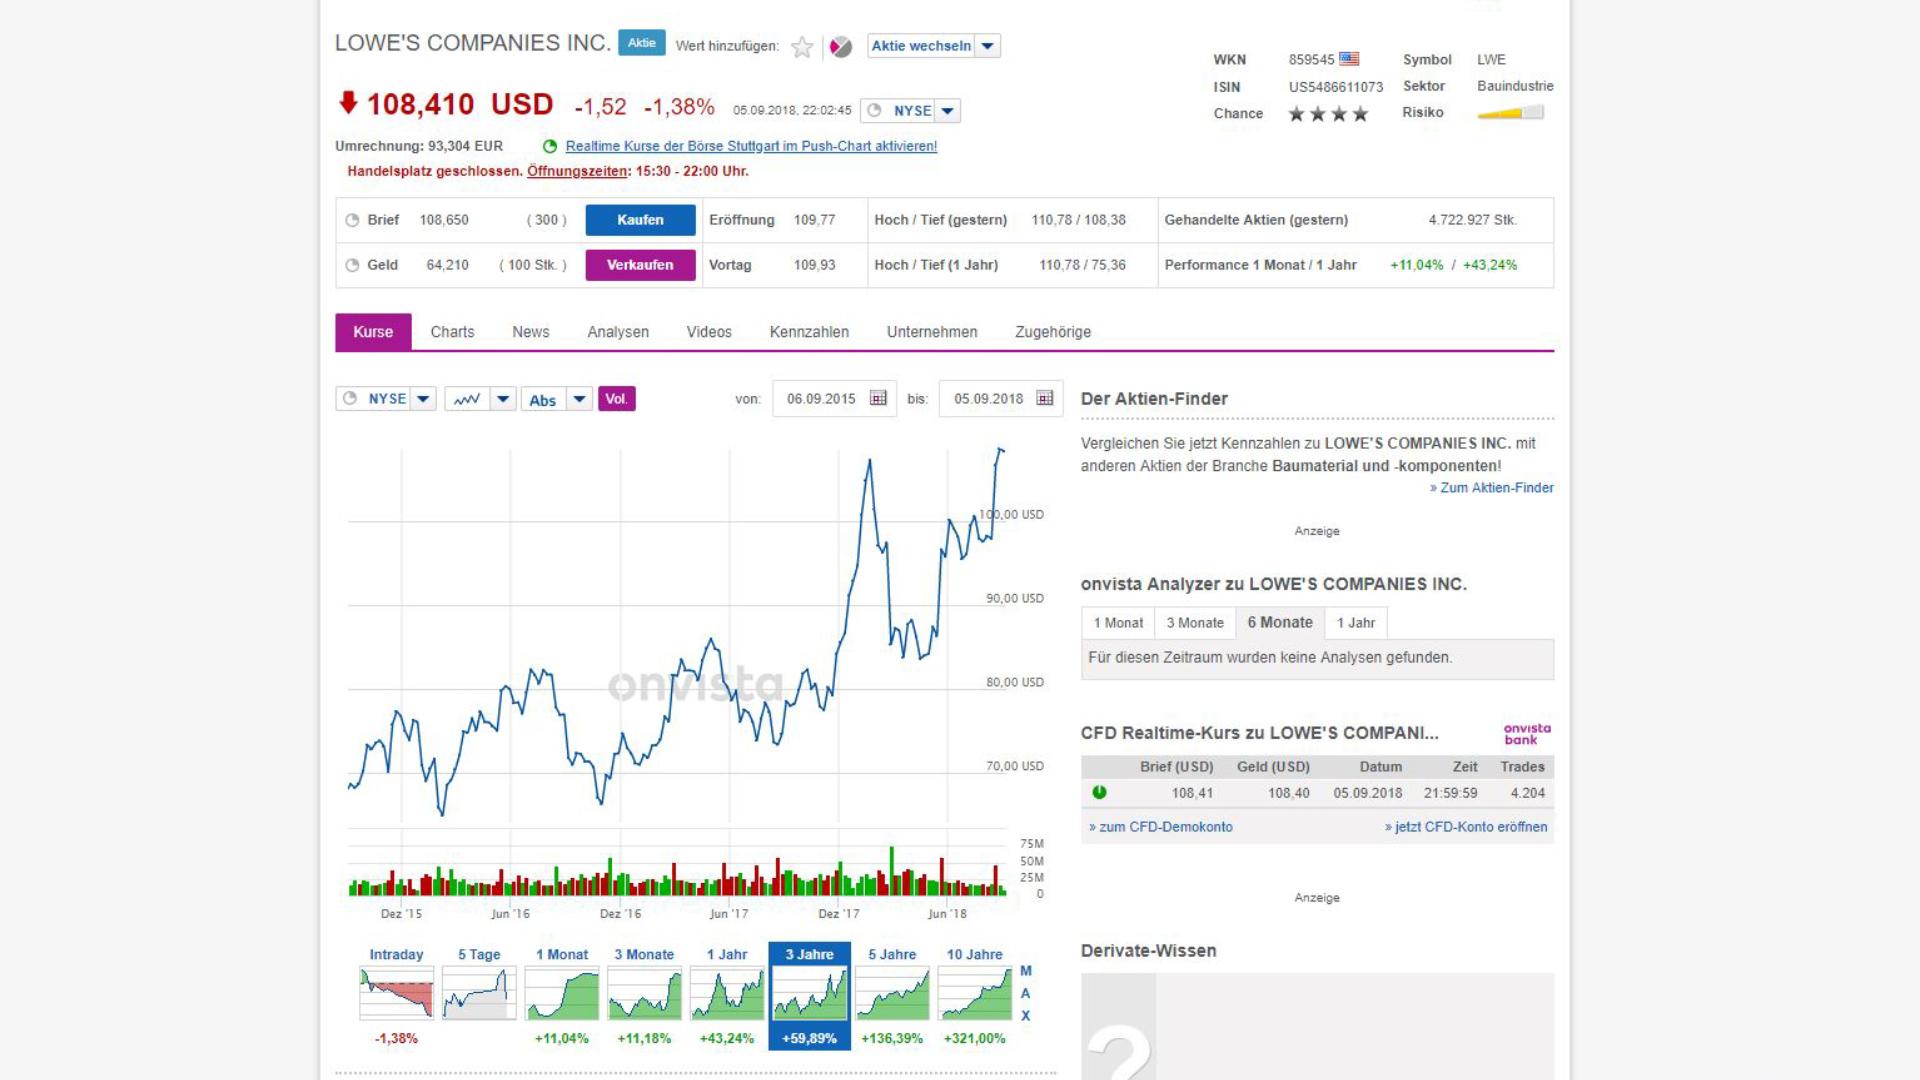 3-Jahres-Chart Lowe's Companies